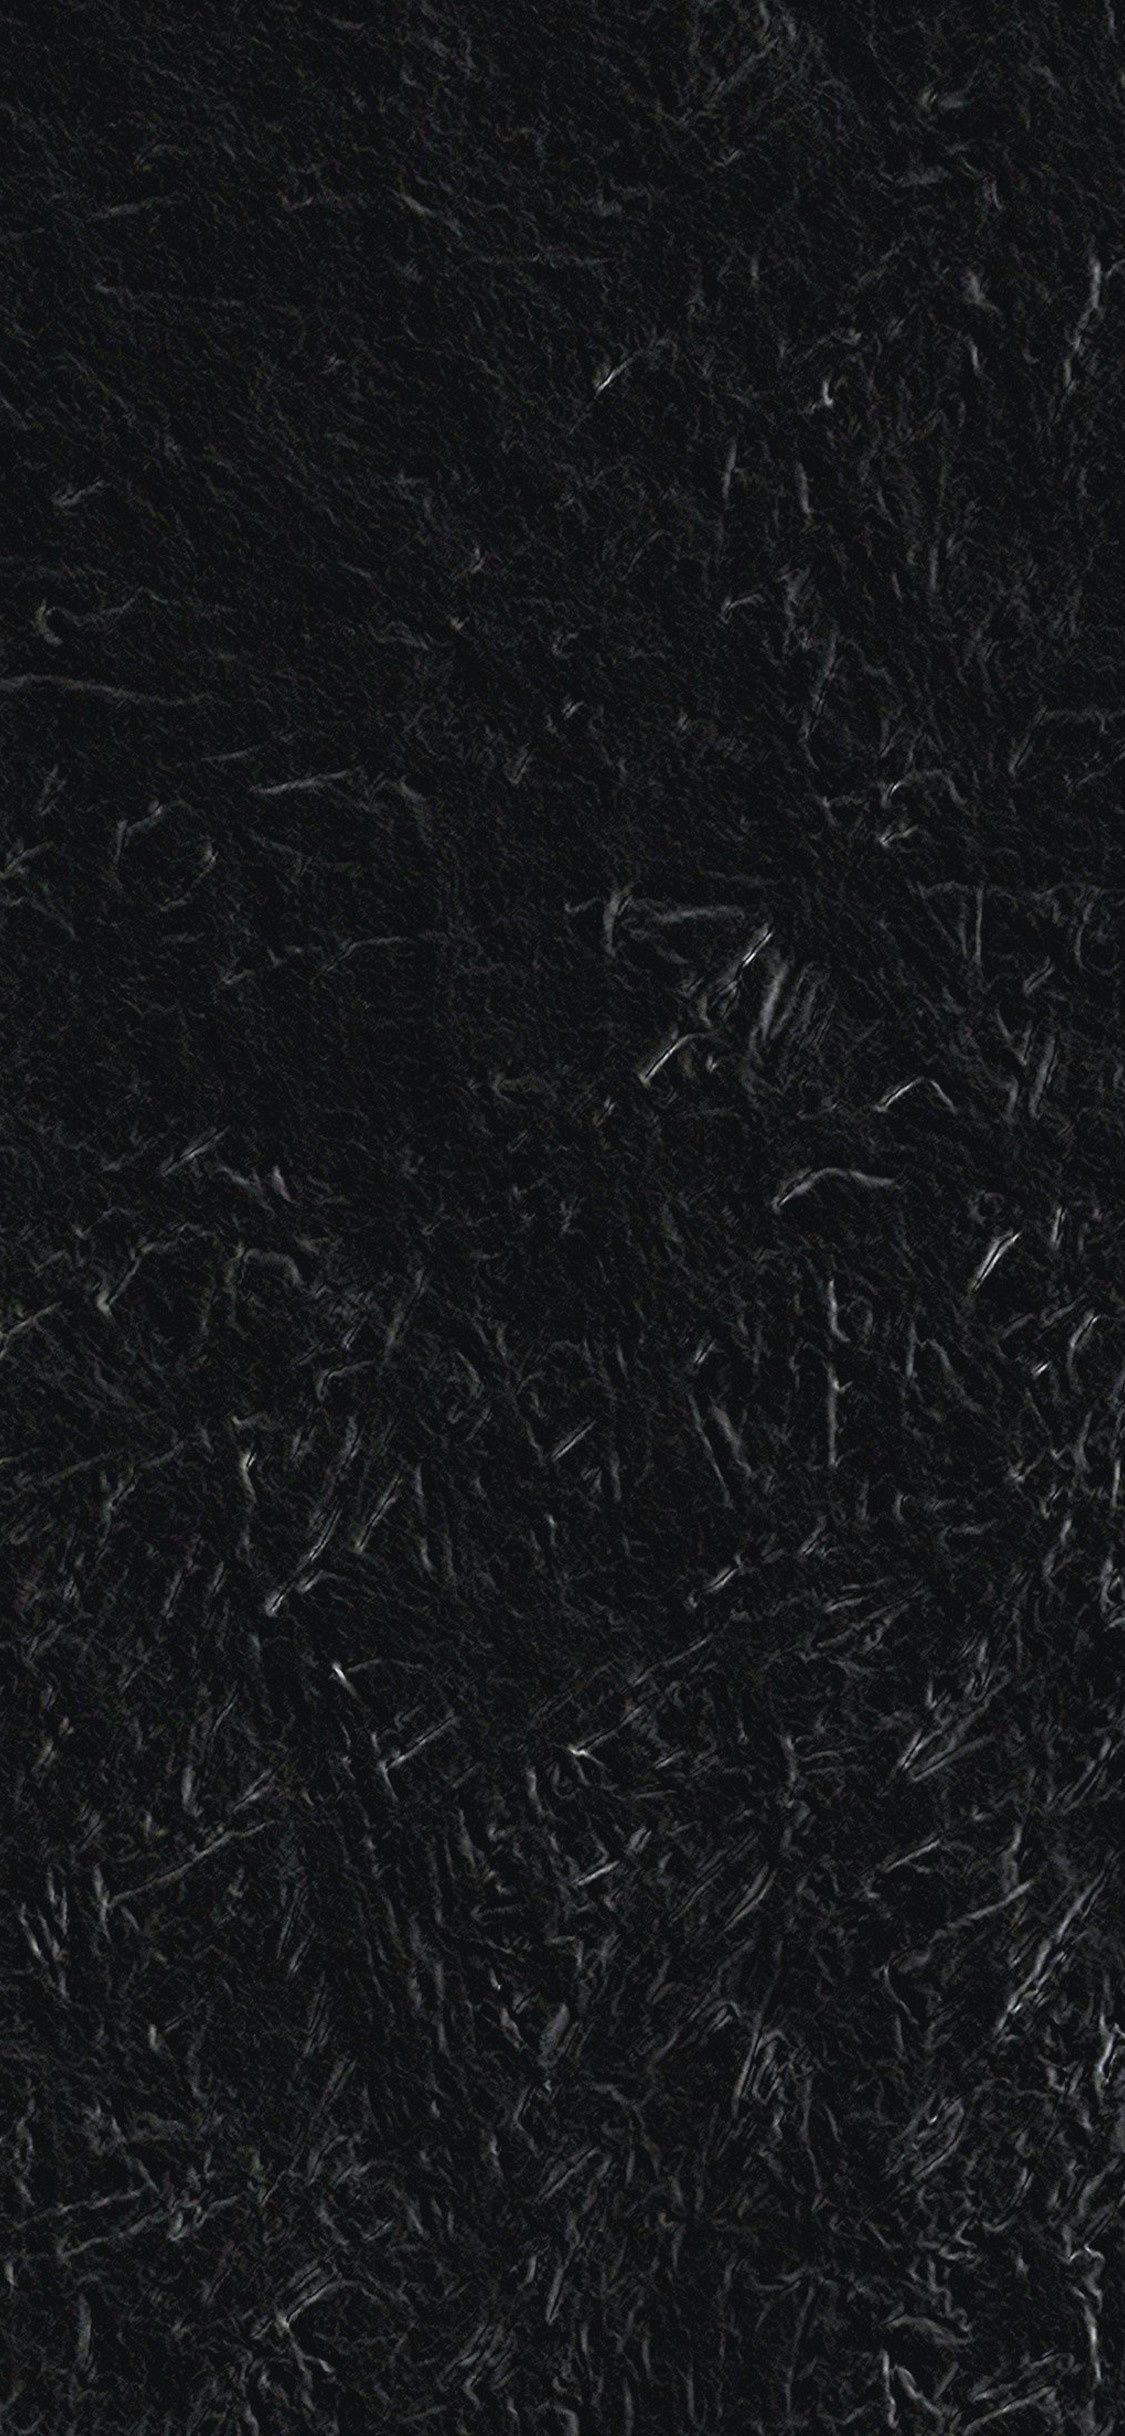 90 Dark Iphone Wallpapers on WallpaperPlay Wallpaper